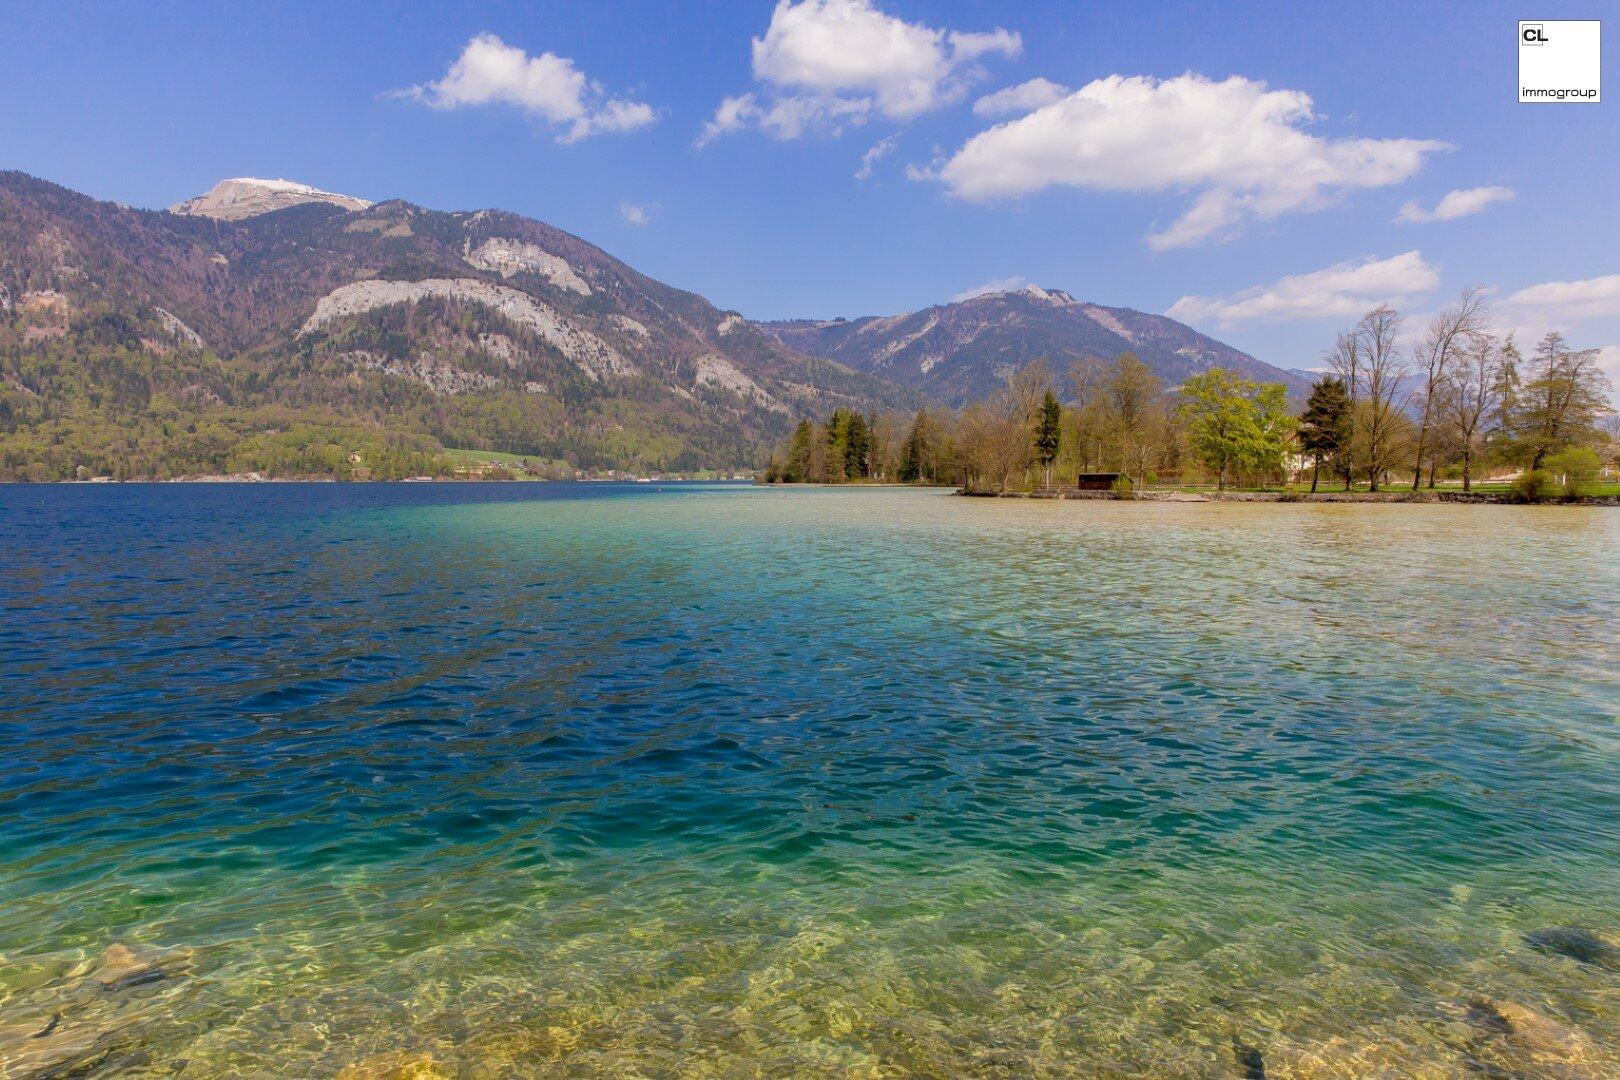 Traumhaftes Seegrundstück direkt am Wolfgangsee